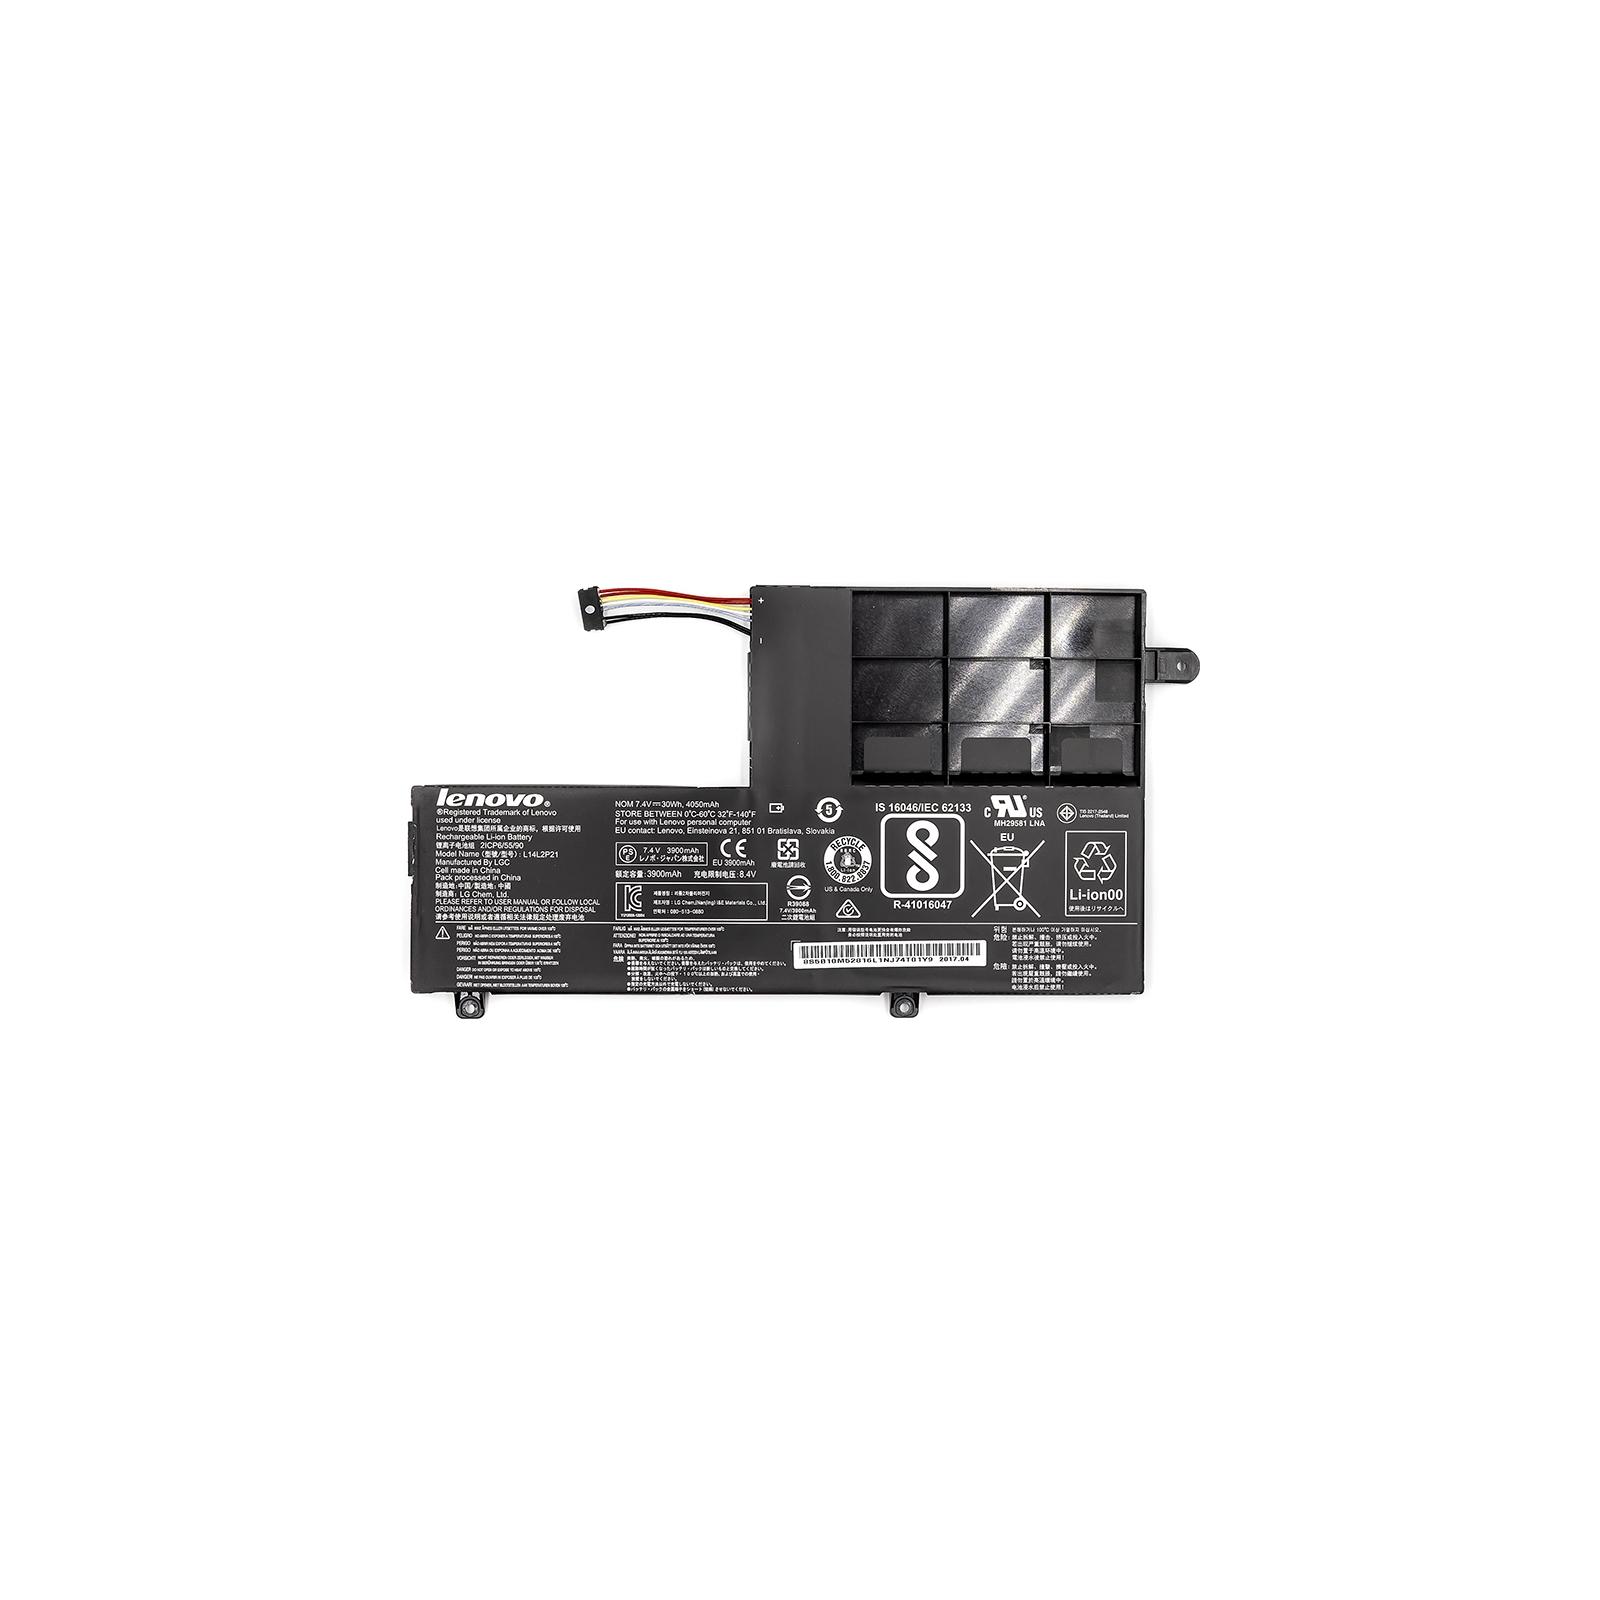 Аккумулятор для ноутбука Lenovo Ideapad 300S (L14M2P21) 7.4V 30Wh (NB480715)